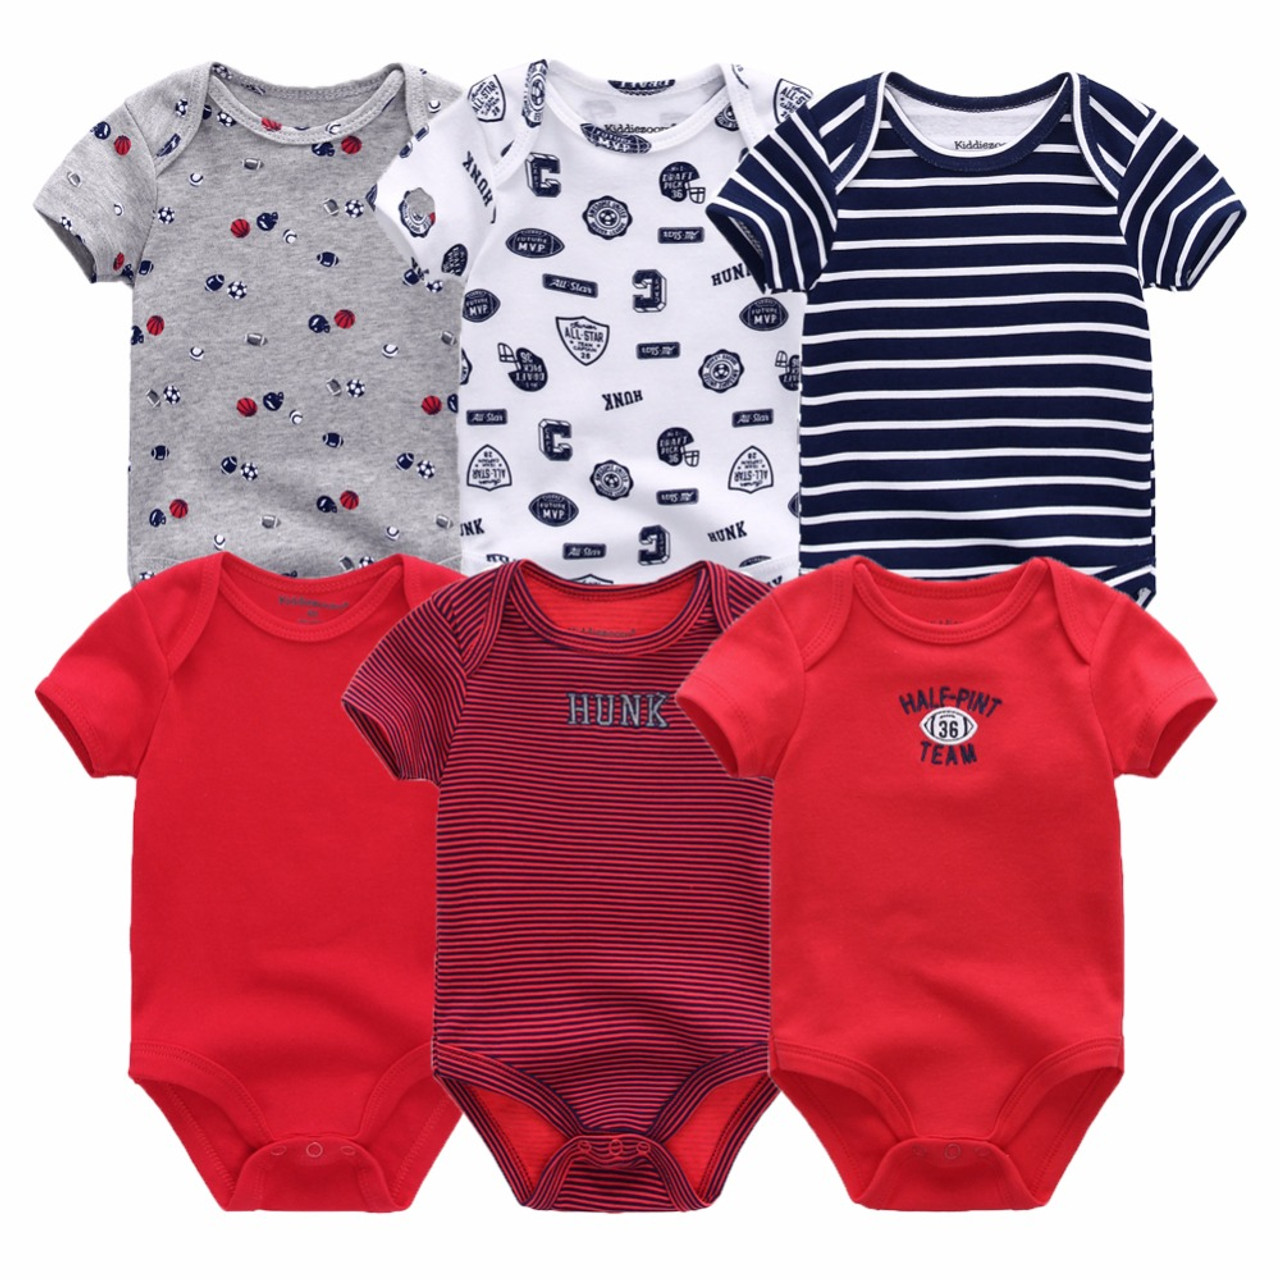 818e442debf56 ... 6 PCS/lot newborn baby bodysuits short sleevele baby clothes O-neck 0-  ...